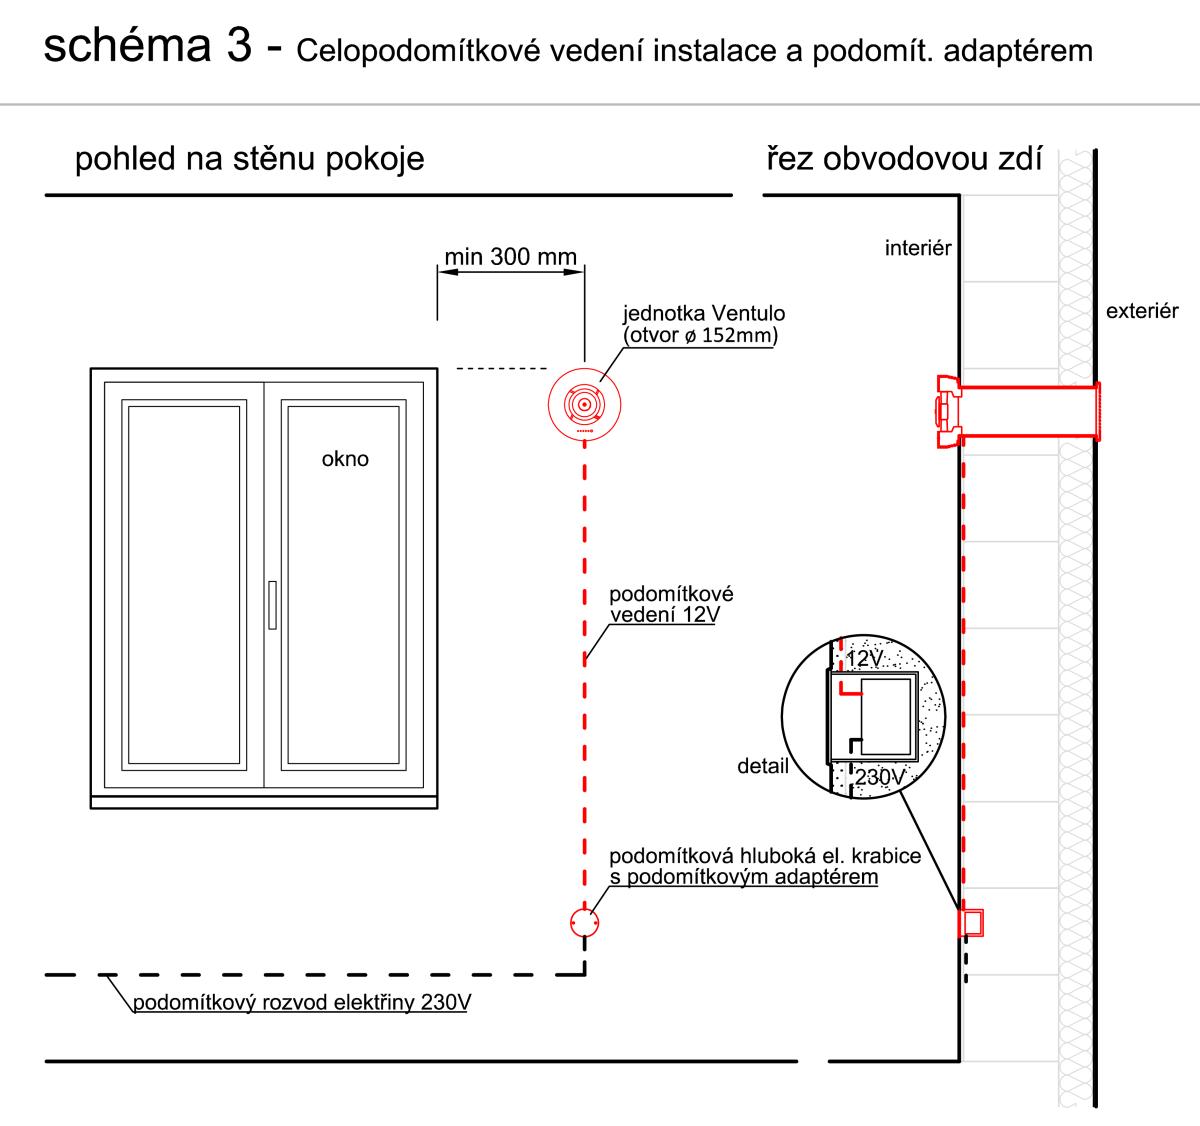 schéma 3 elektroinstalace jednotky Ventulo